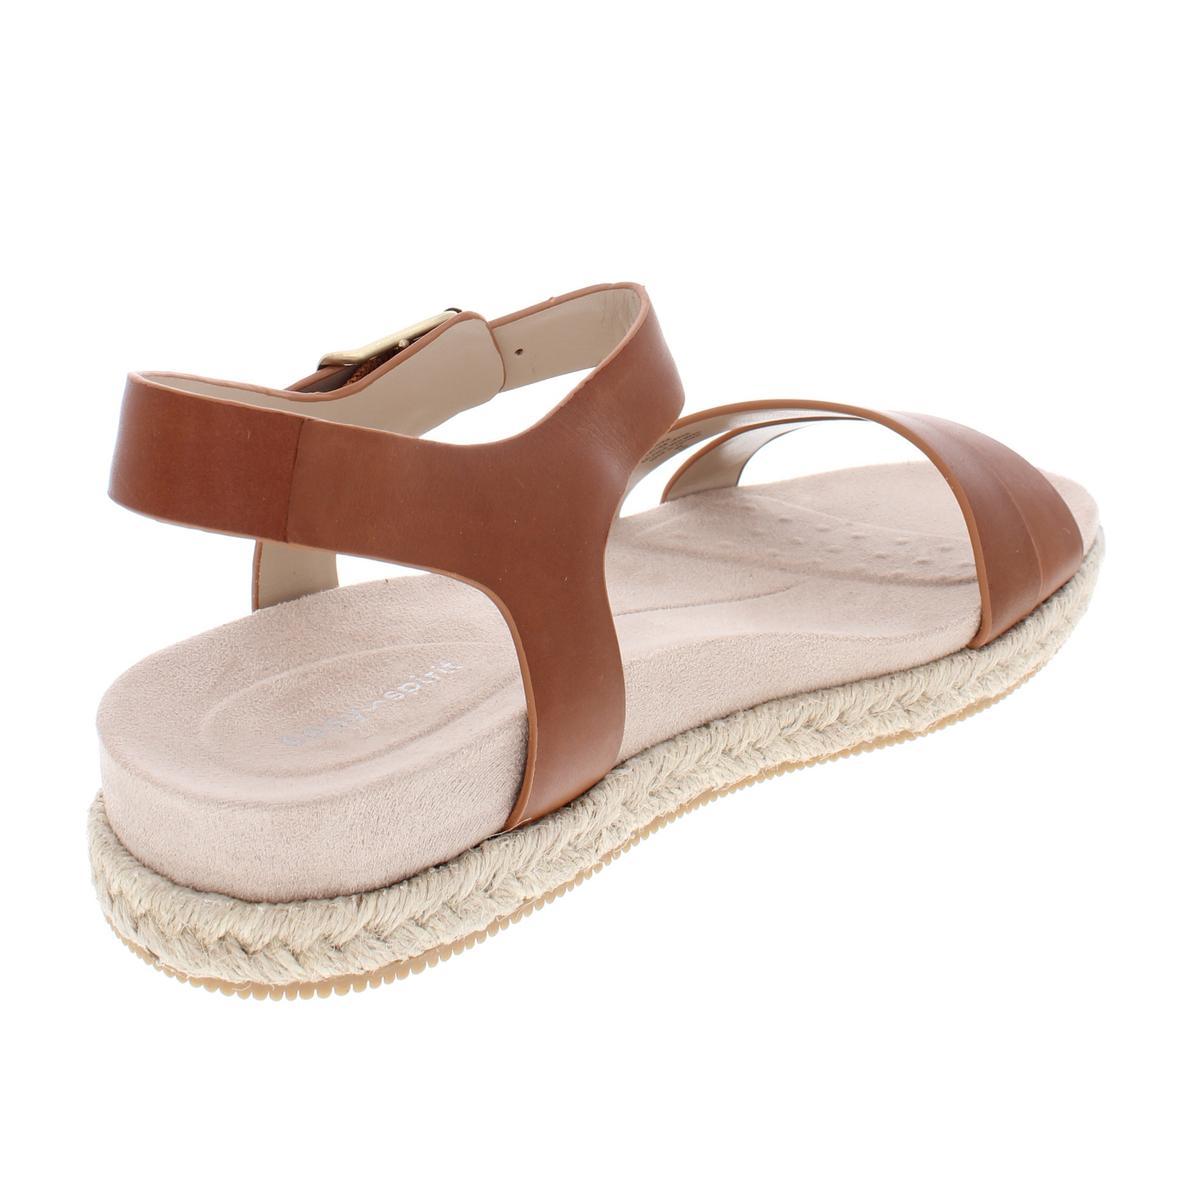 bd40dd57c2a Easy Spirit Womens Ixia Solid Leather Platform Espadrilles Sandals ...